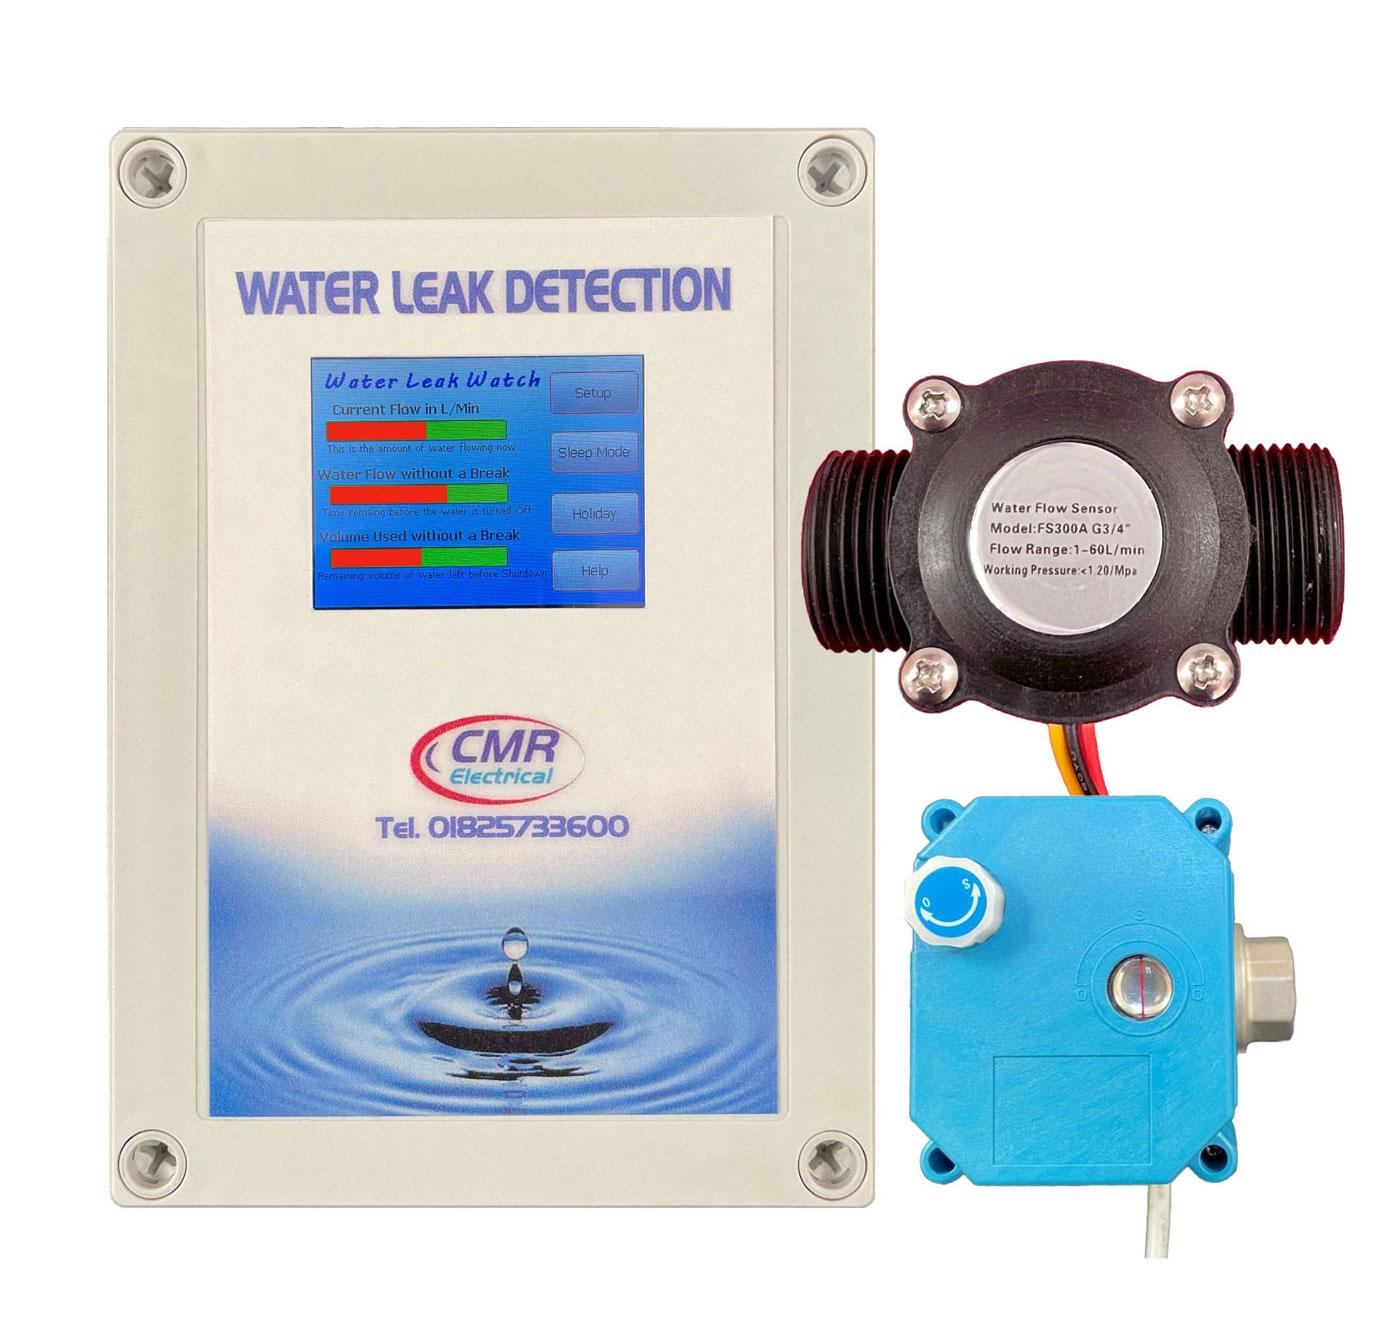 WLW alarm unit, sensor and shut off valve